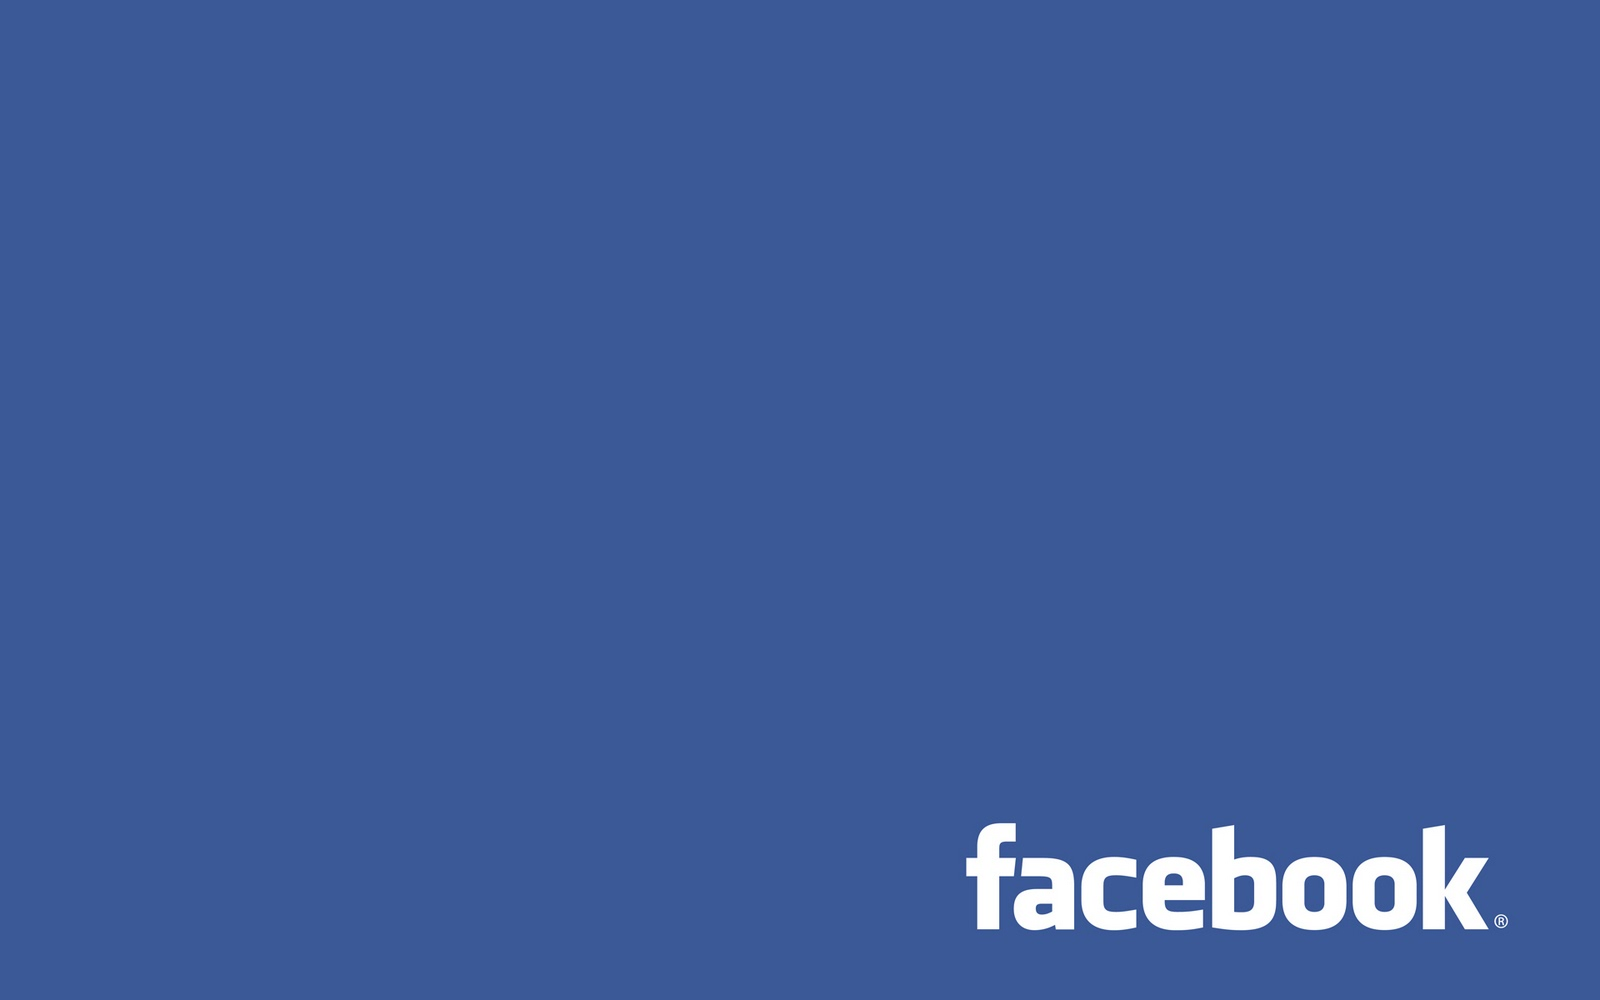 Facebook Wallpaper 5